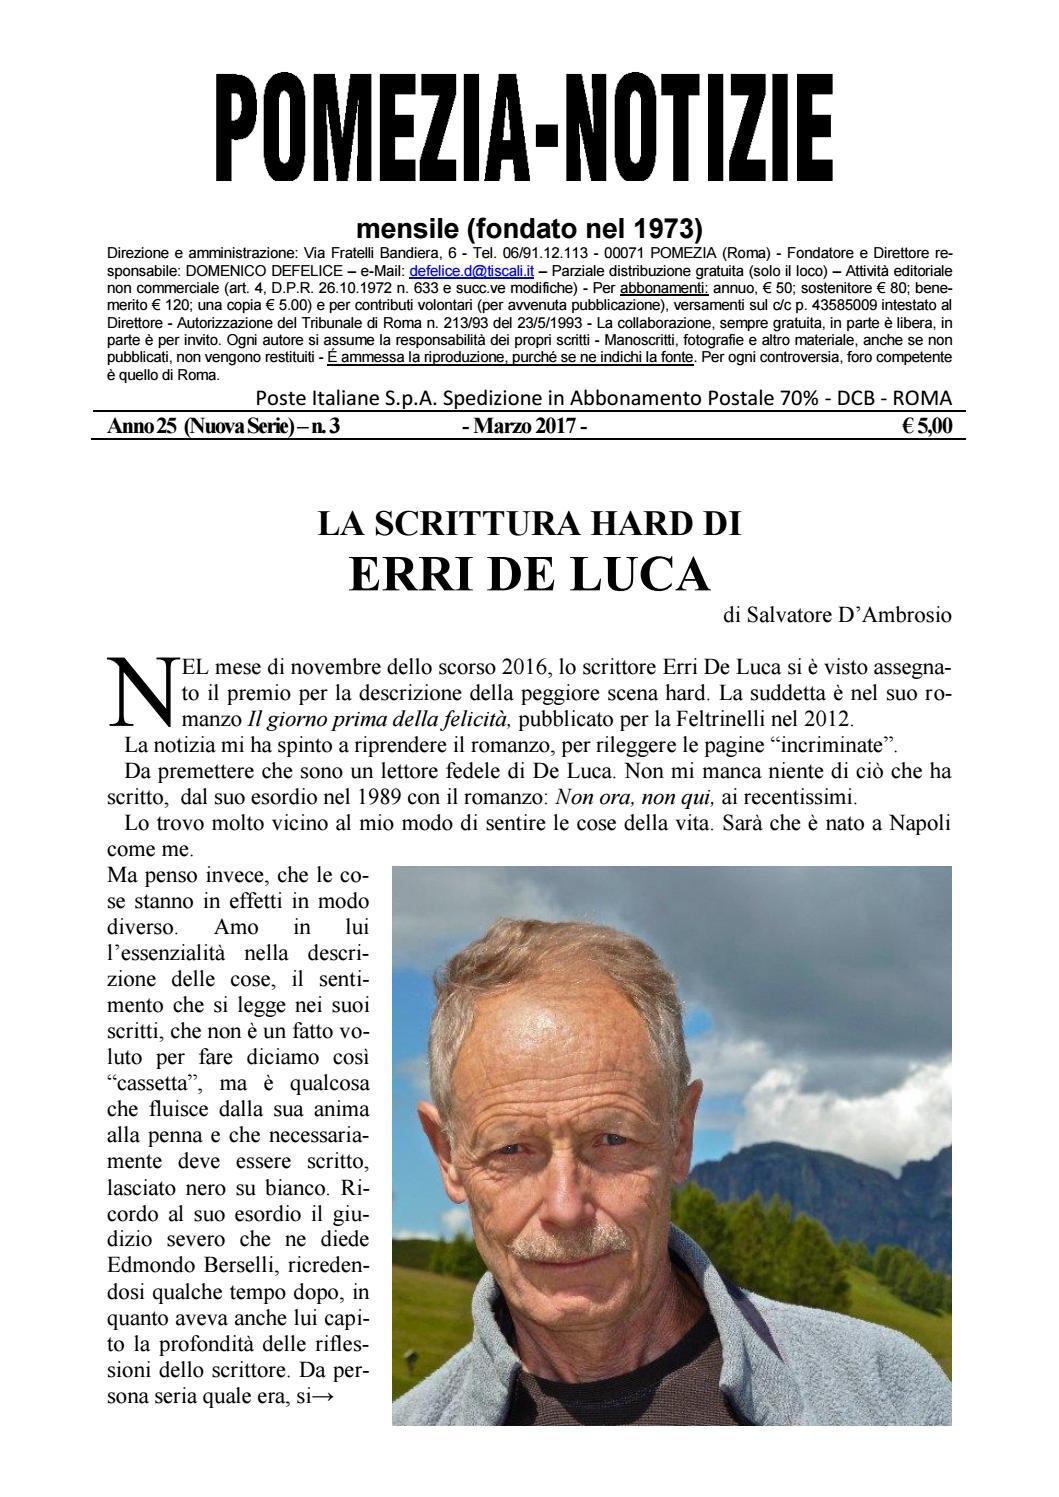 Pomezia Notizie 2017 3 by Domenico - issuu 87ccbbede43